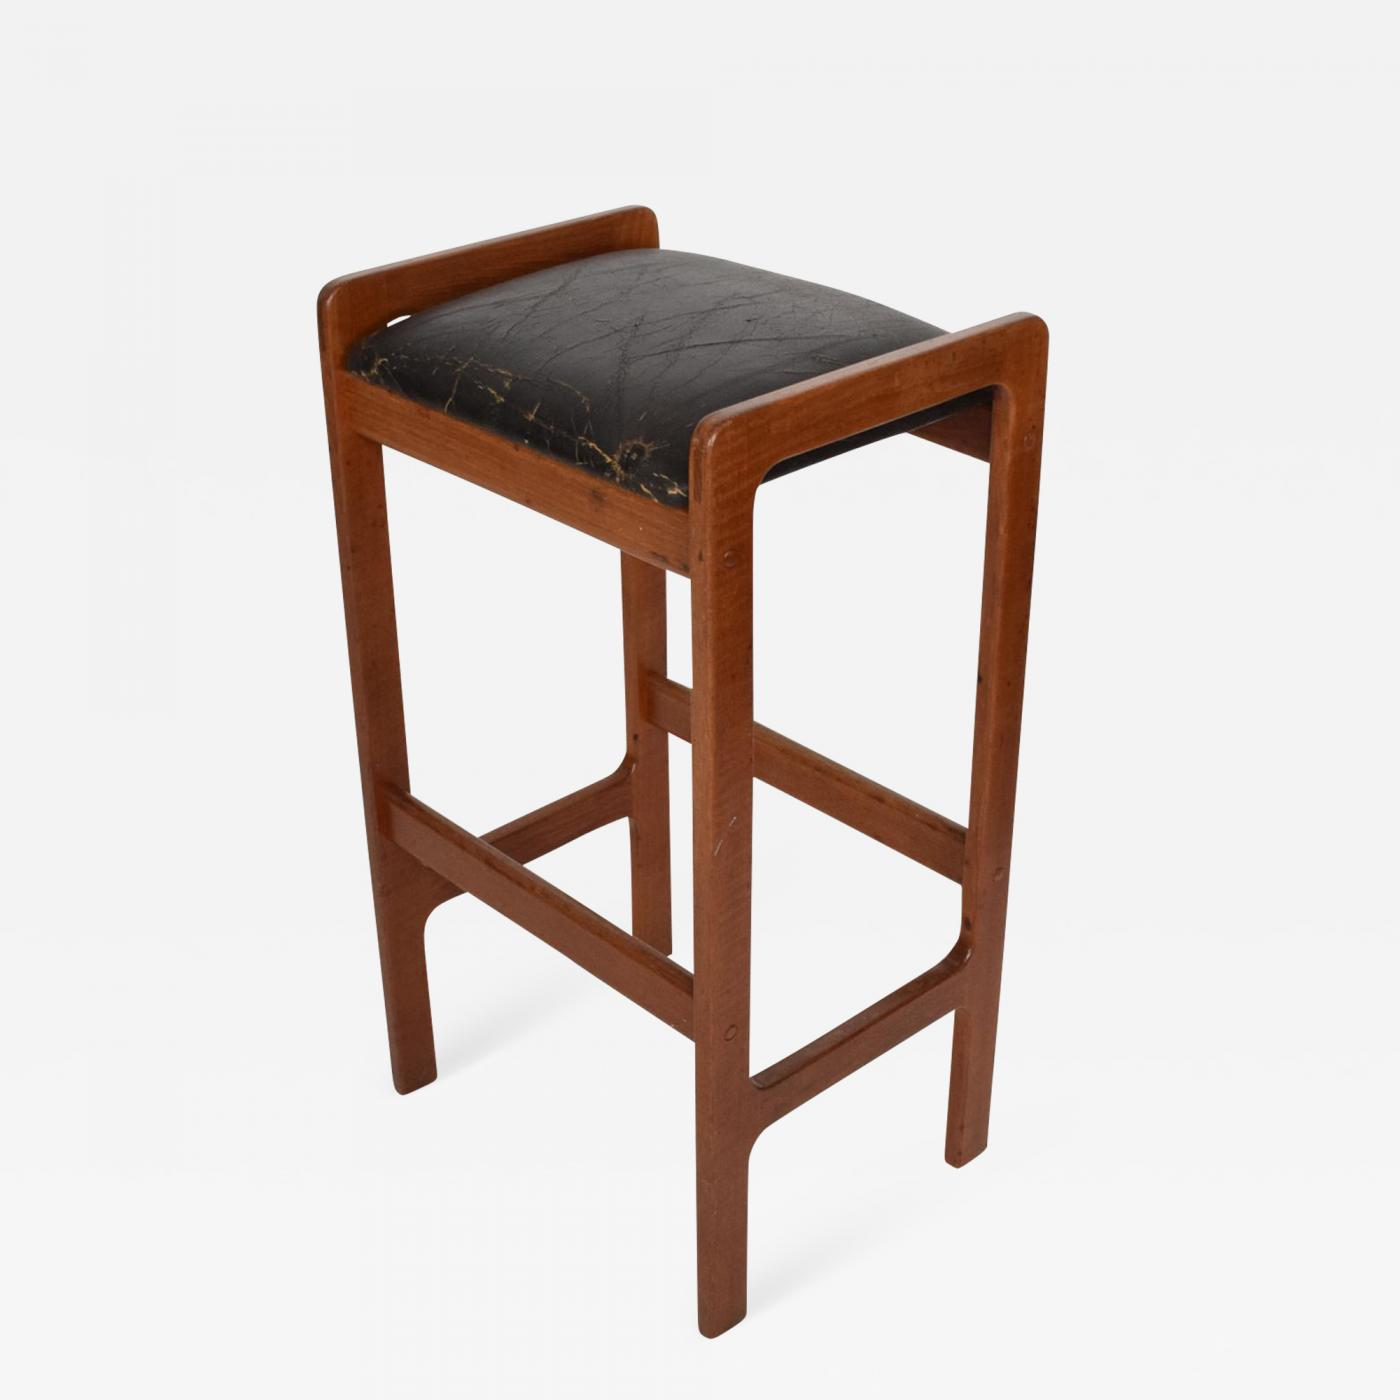 Hans Wegner Danish Modern Teak Bar Stool With Leather Seat